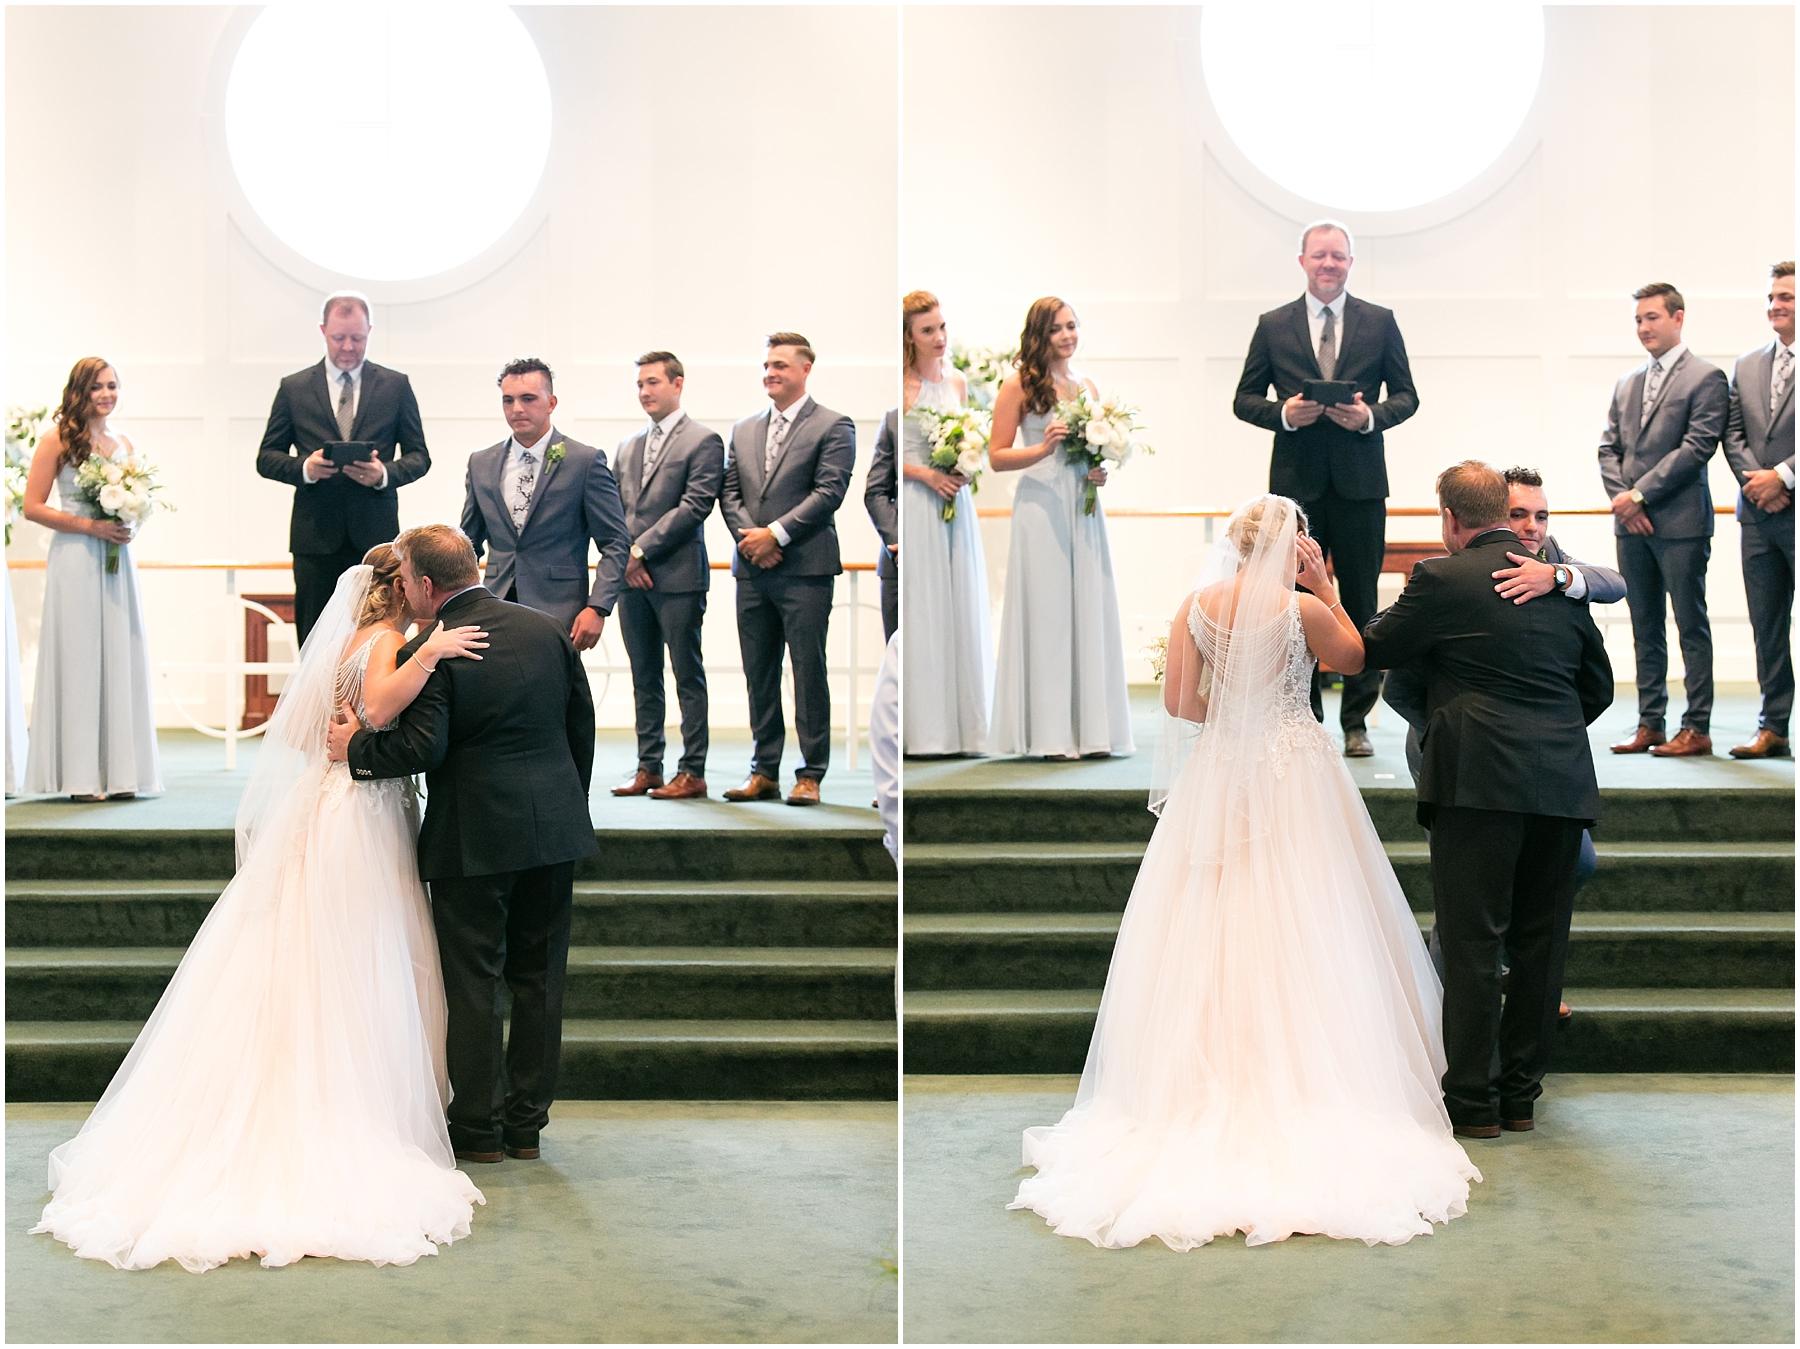 virginia beach wedding photography,here and now bridal wedding dress, jessica ryan photography, jessica ryan photographer, new convenant presbyterian church wedding ceremony